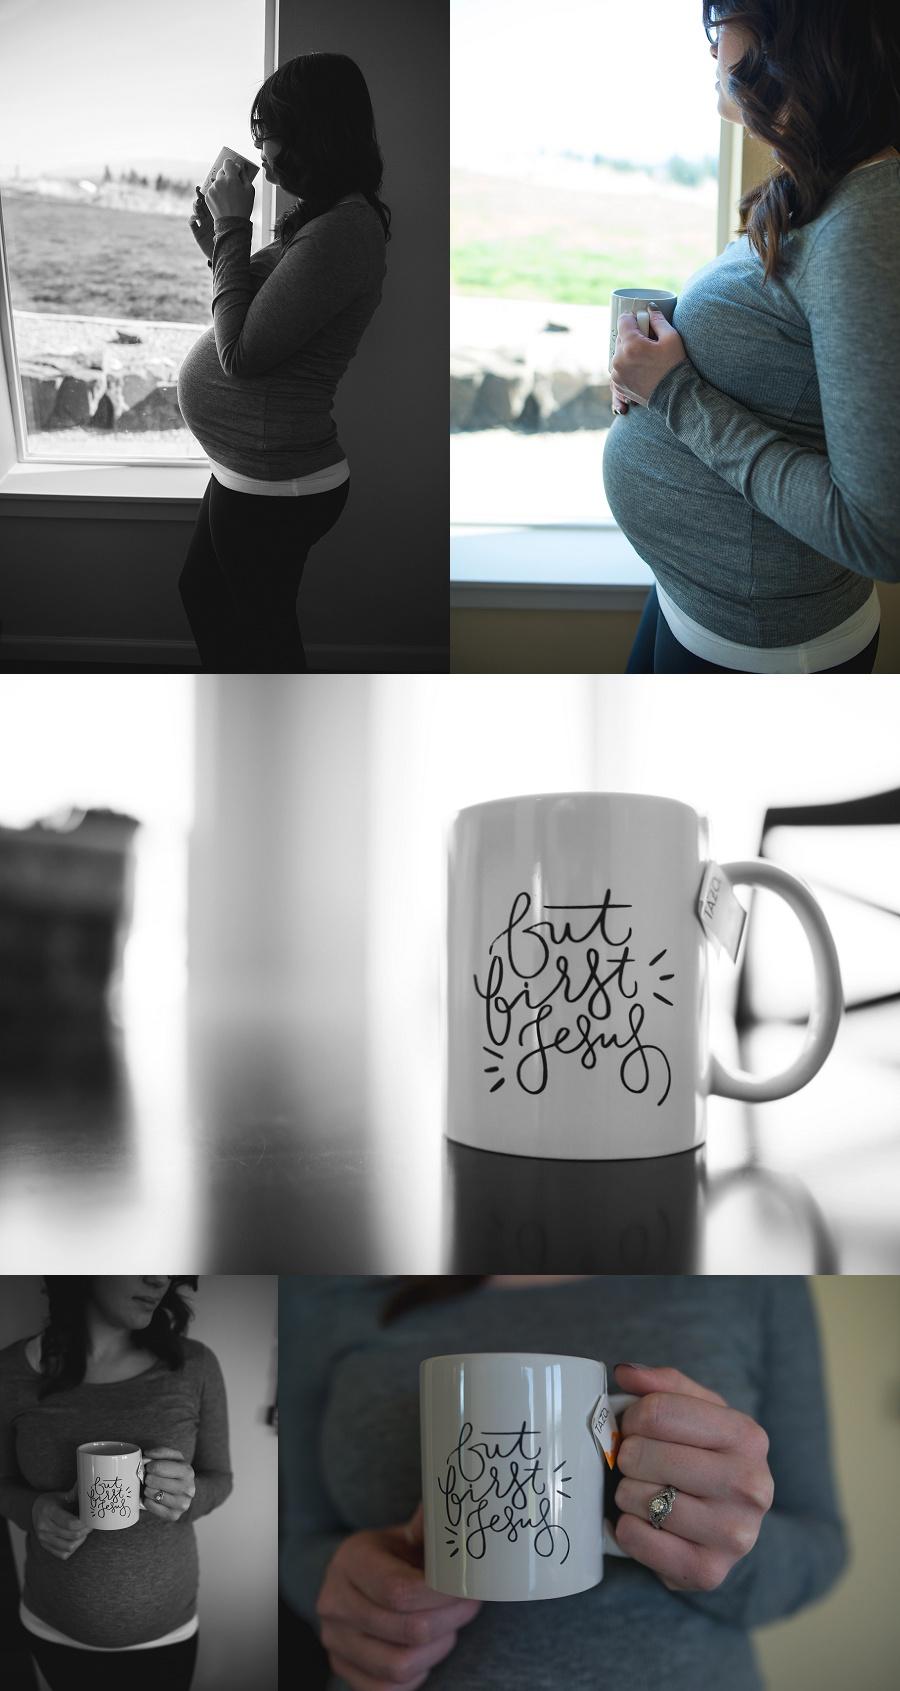 Lifestyle maternity photos by Nicole Briann Photography, Oregon